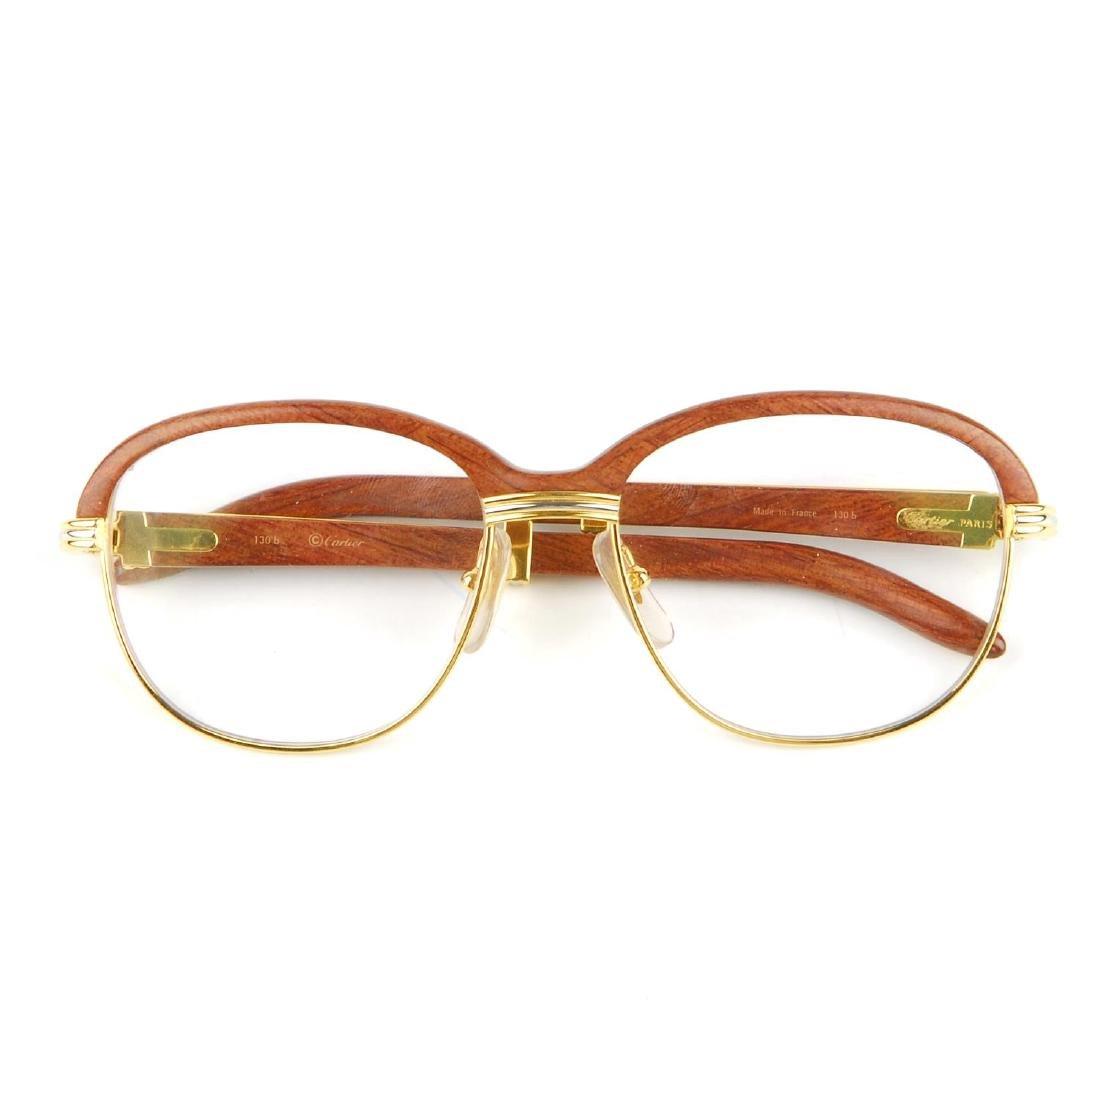 78ef46667f45 Cartier a pair of malmaison palisander rosewood jpg 1100x1100 Cartier  malmaison palisander rosewood